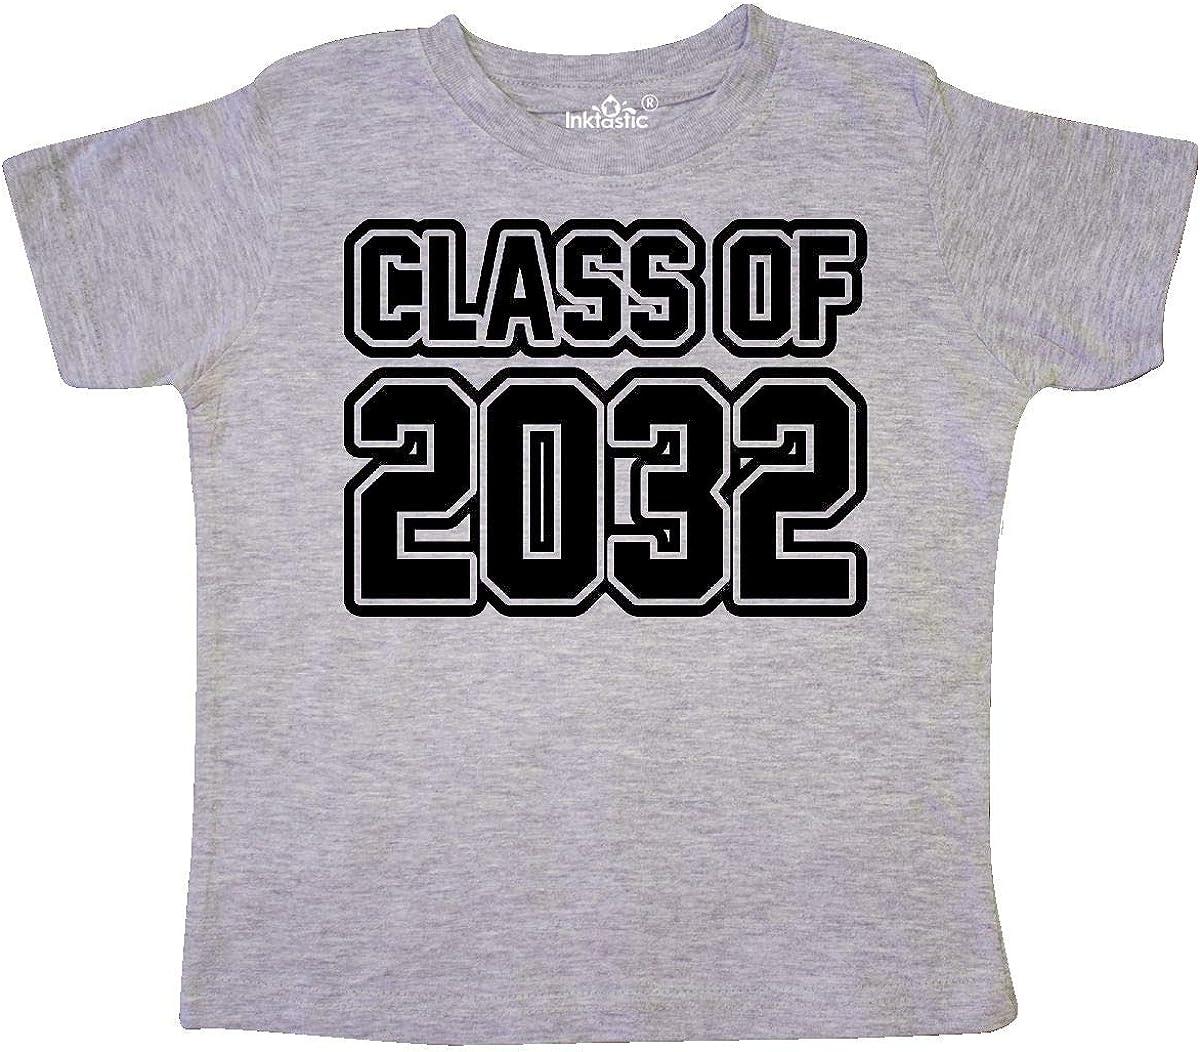 inktastic Class of 2032 Toddler T-Shirt